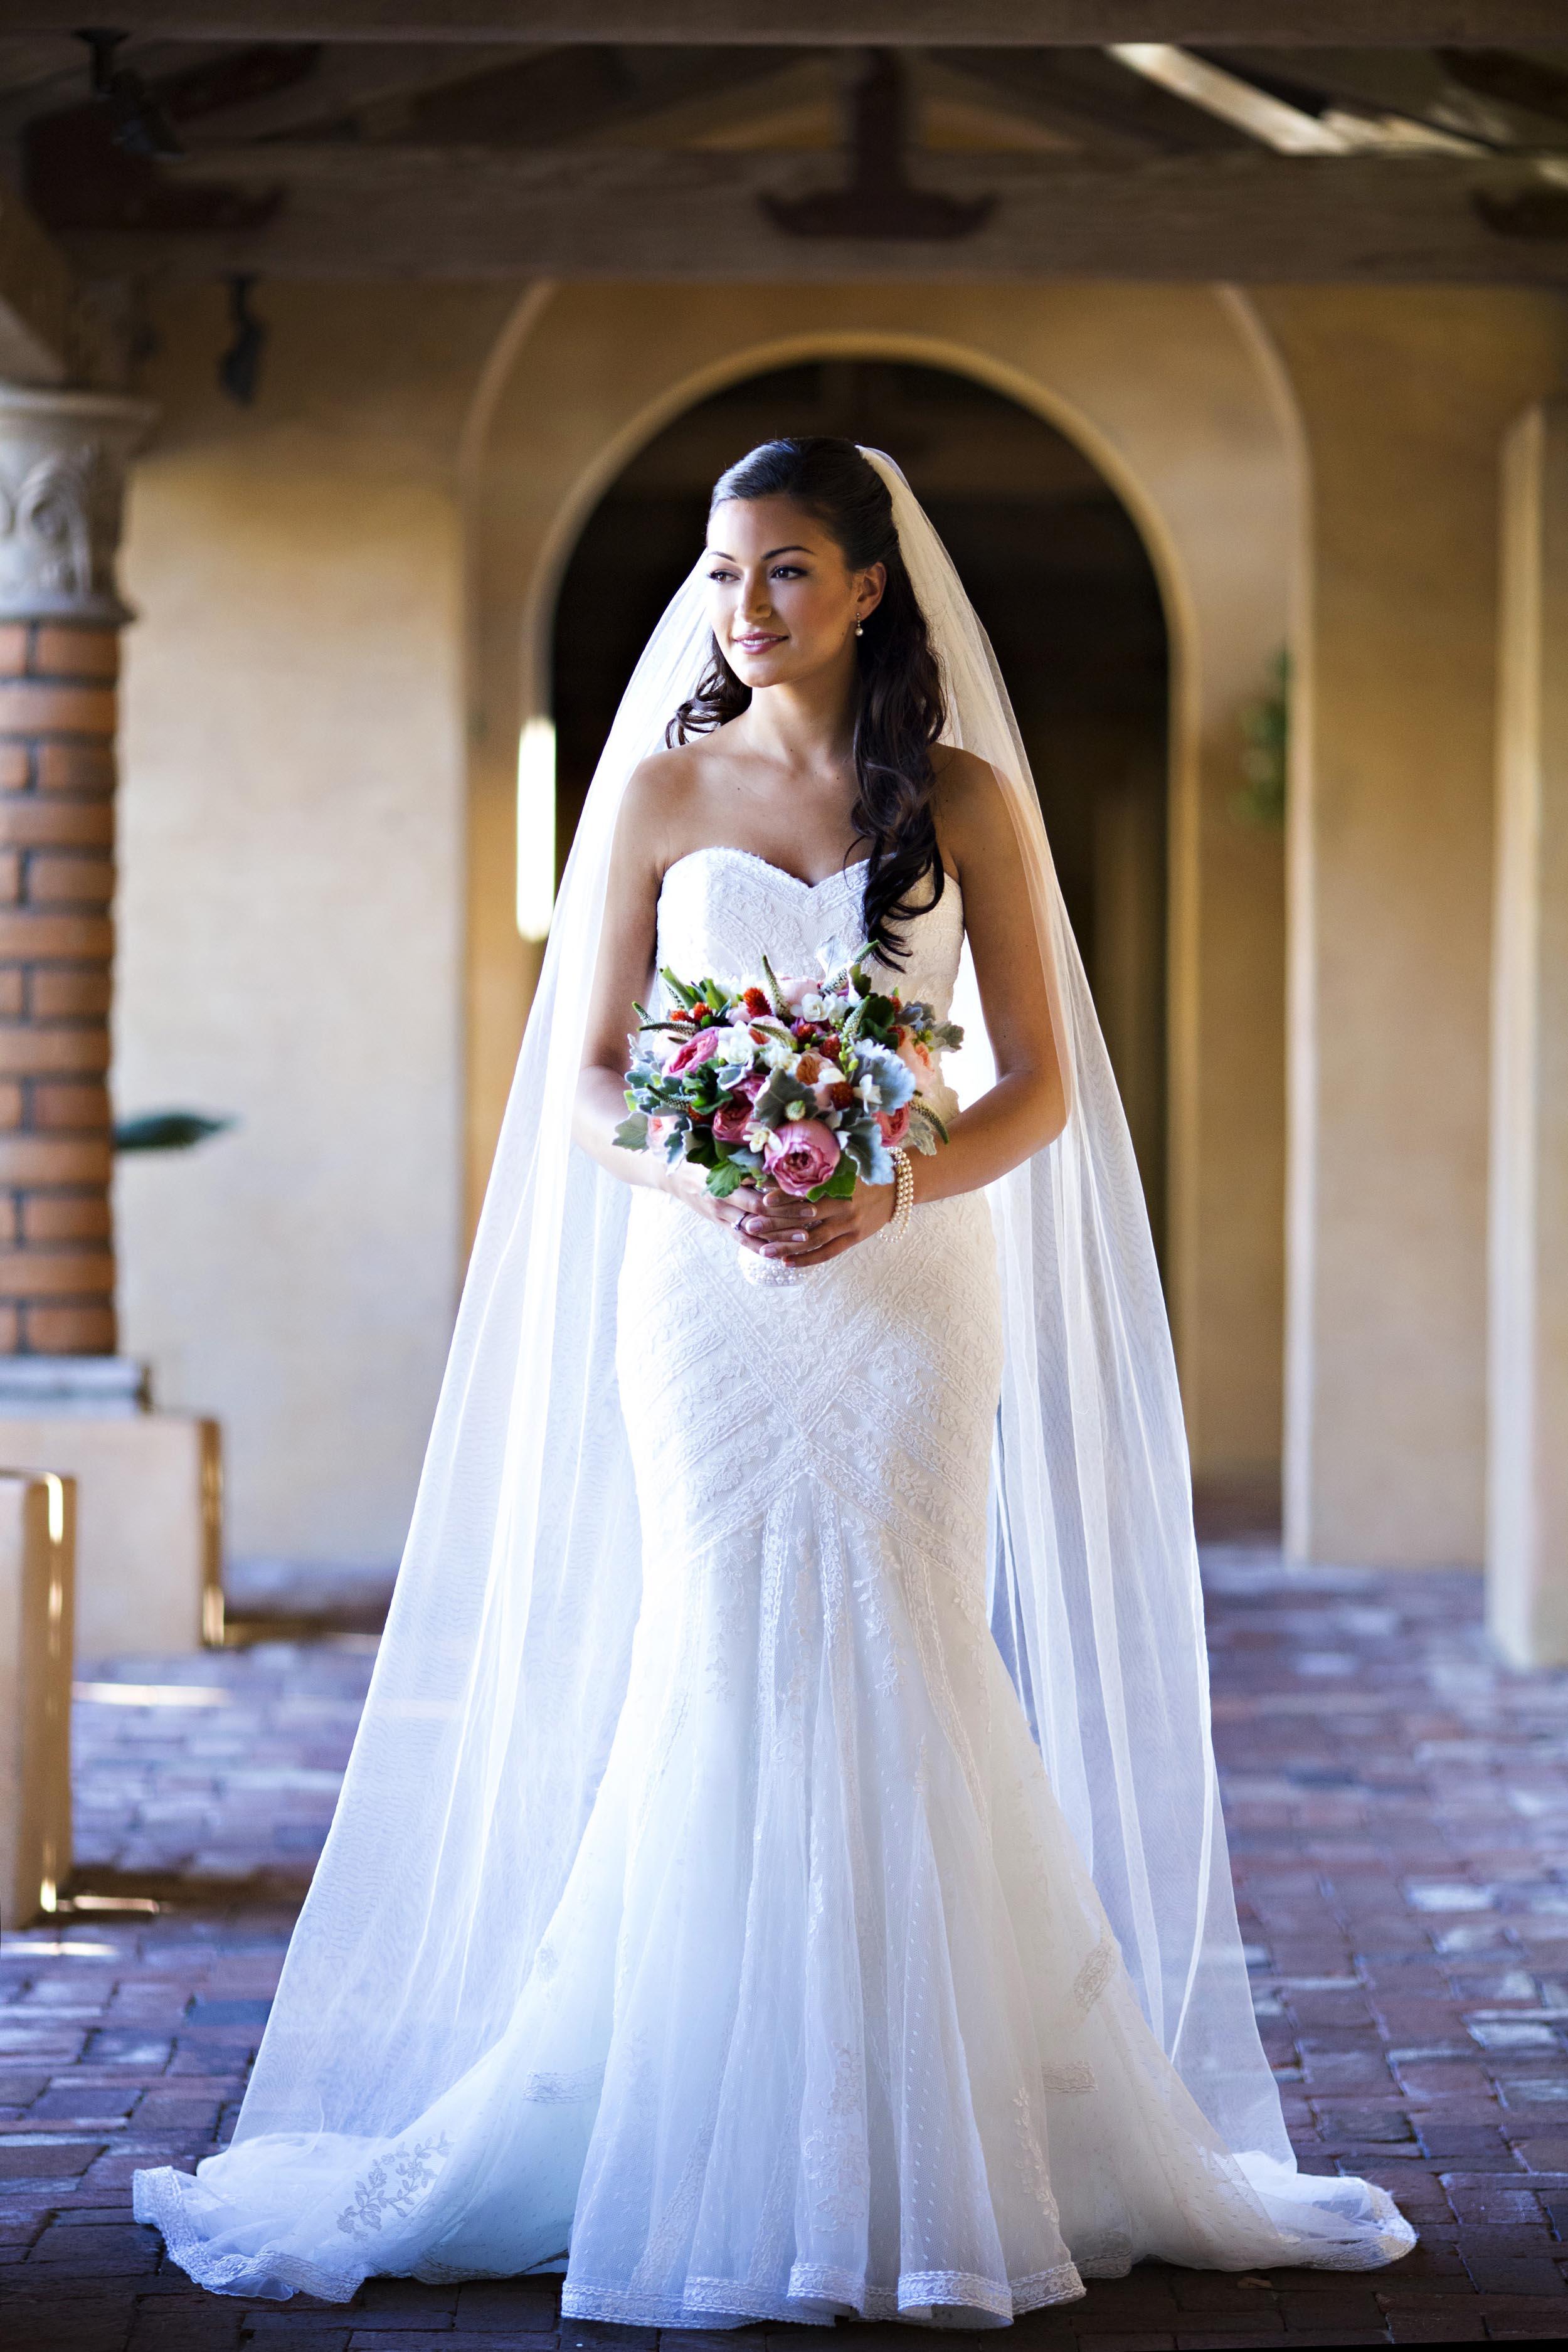 weddings-royalpalms-03.JPG